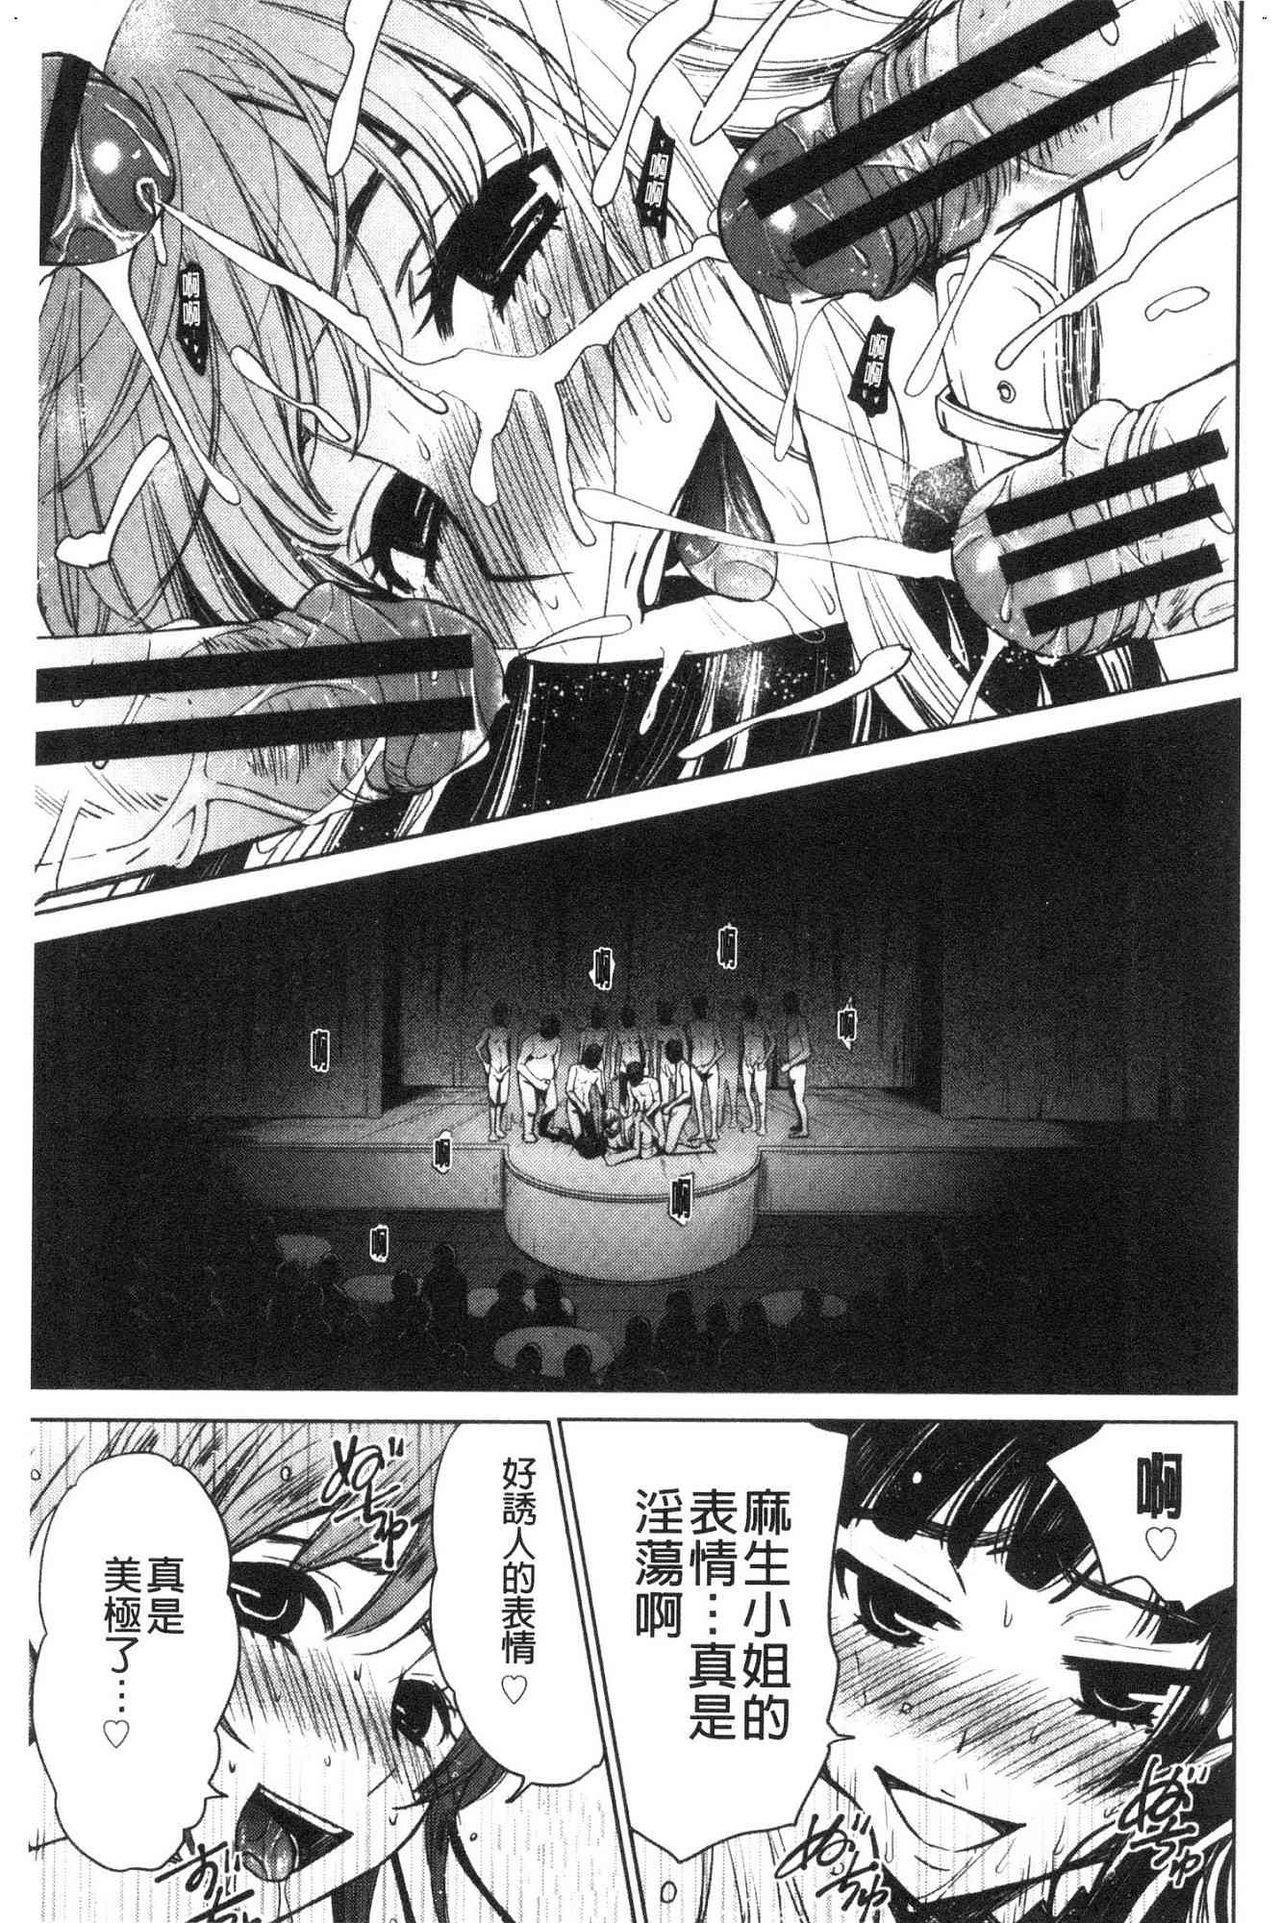 [Gotoh Akira]  21-ji no Onna ~Camera no Mae no Mesuinu~ 2 | 21時之女 ~鏡頭前的牝犬~ 2 [Chinese] 180